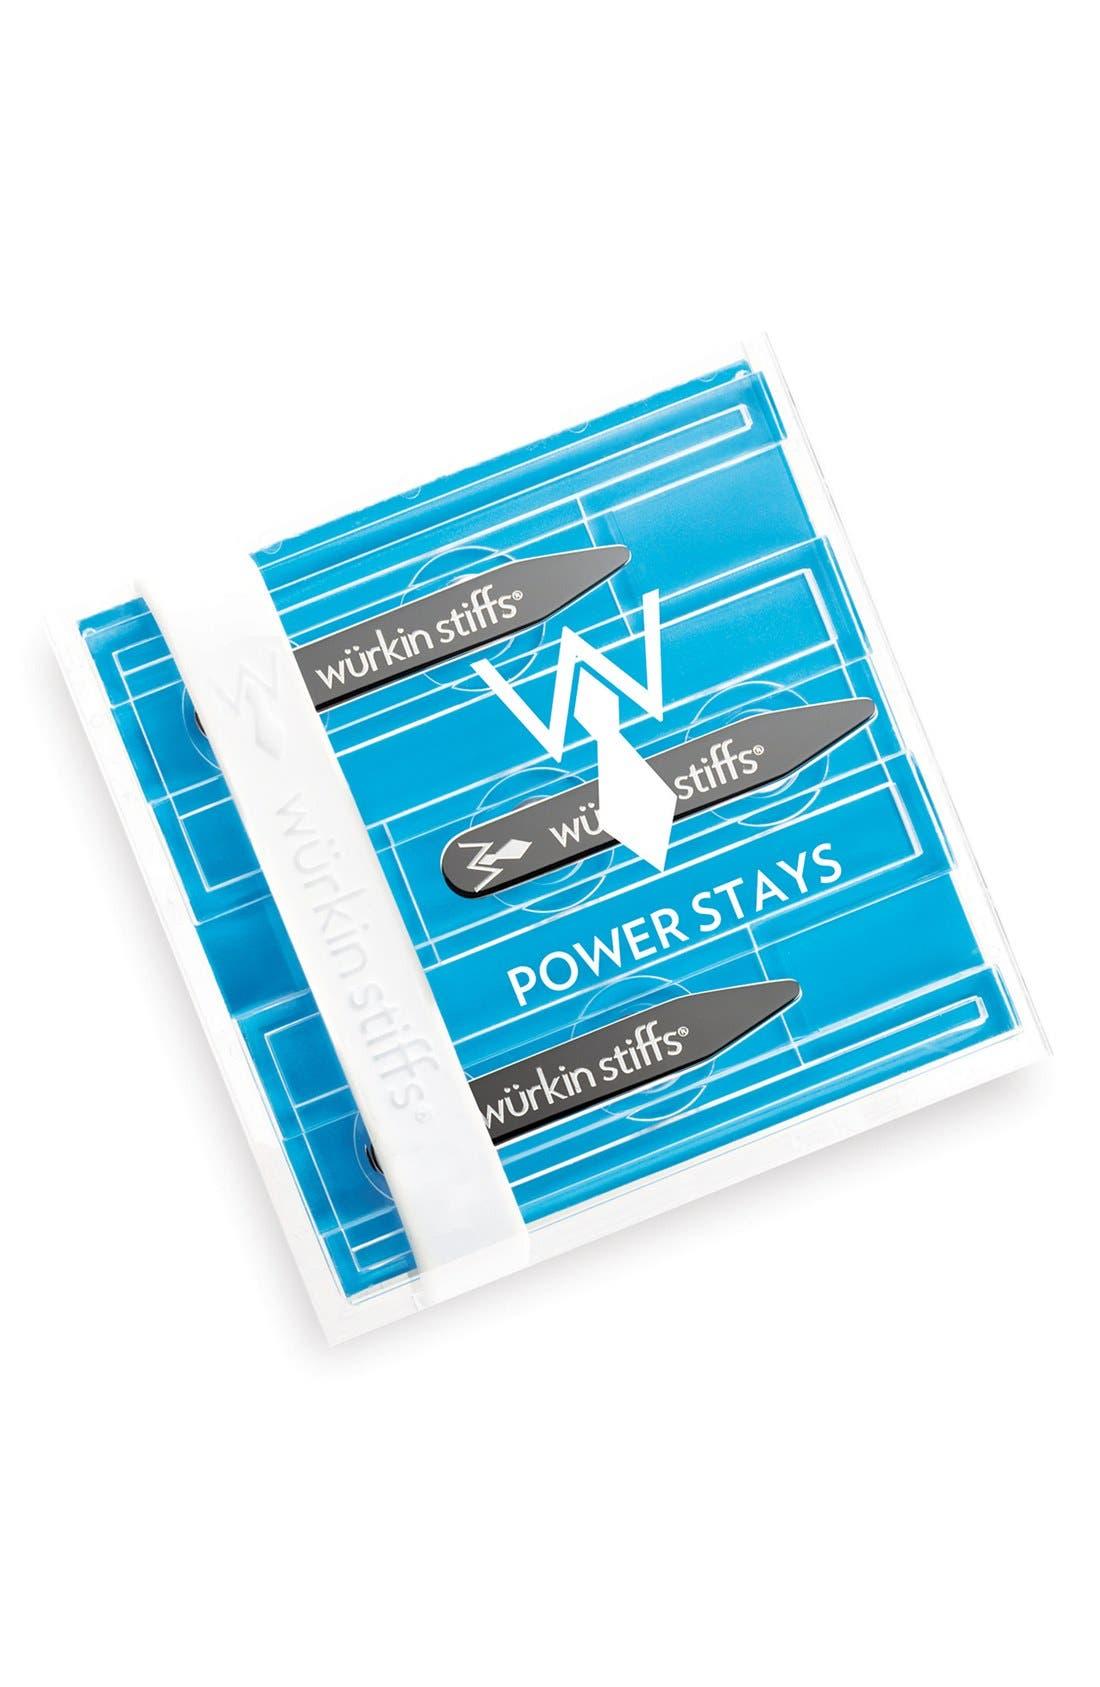 Alternate Image 1 Selected - Würkin Stiffs 'Power Stays' Collar Stays (Set of 3)